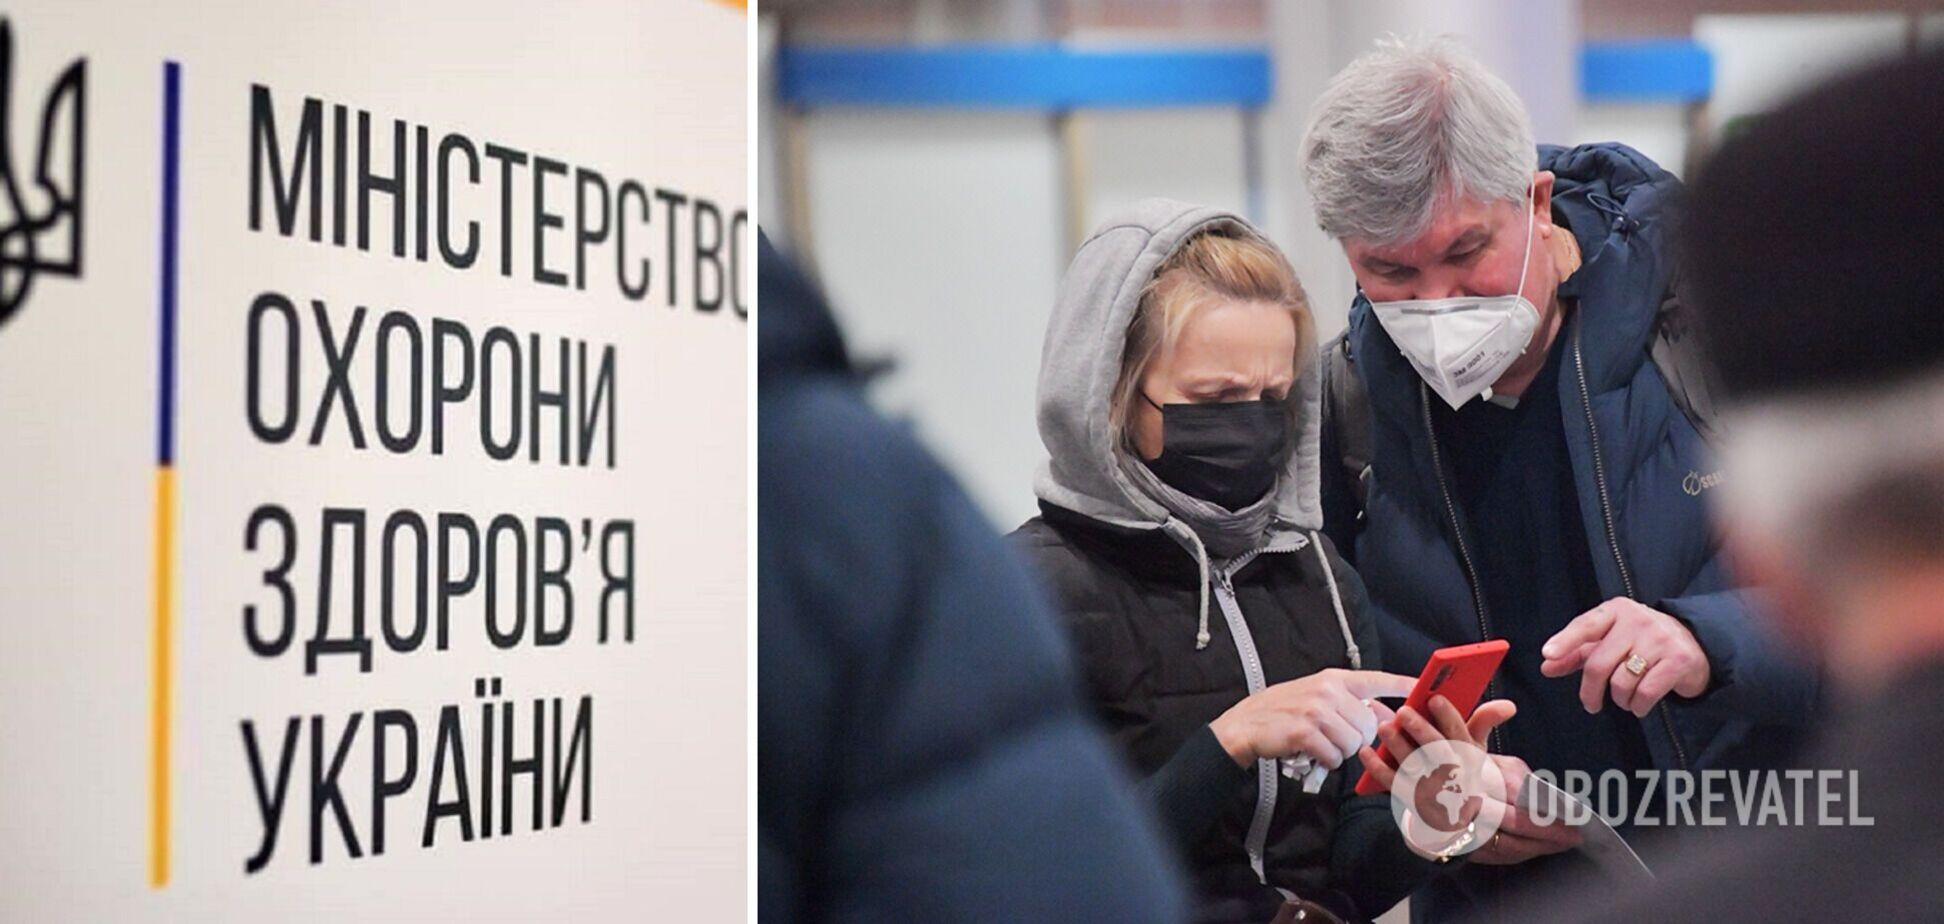 Благодаря адаптивному карантину Минздрава COVID-19 в Украине идет на спад, – эпидемиолог